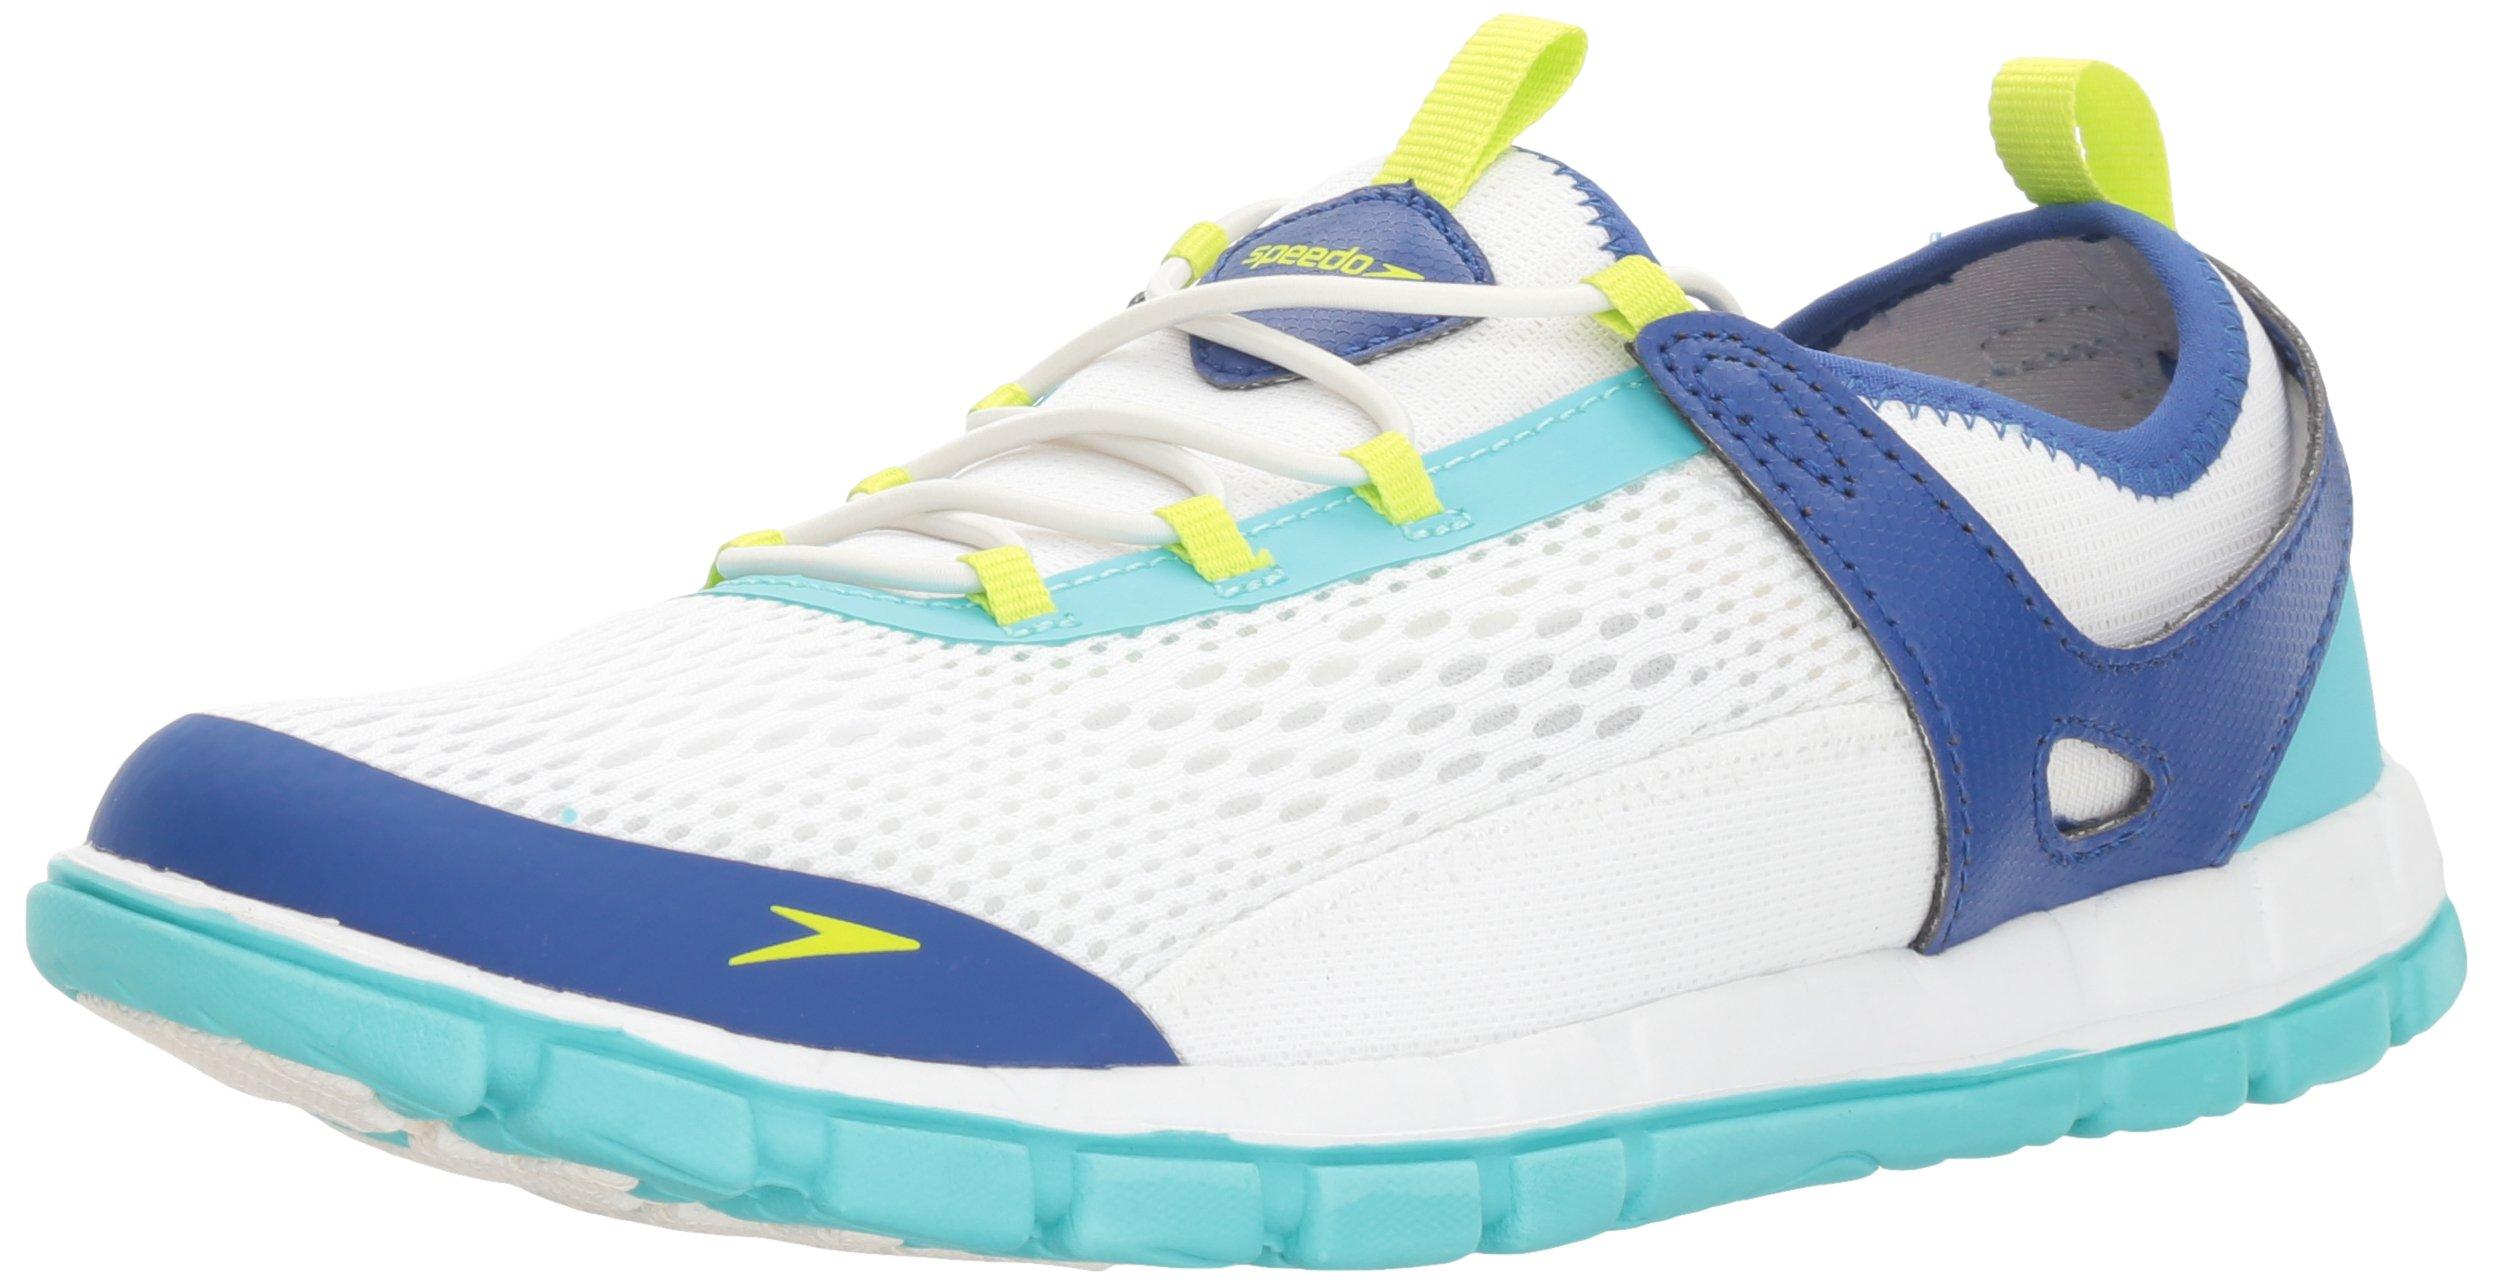 Speedo Women's The Wake Athletic Water Shoe, White/Blue, 9 C/D US